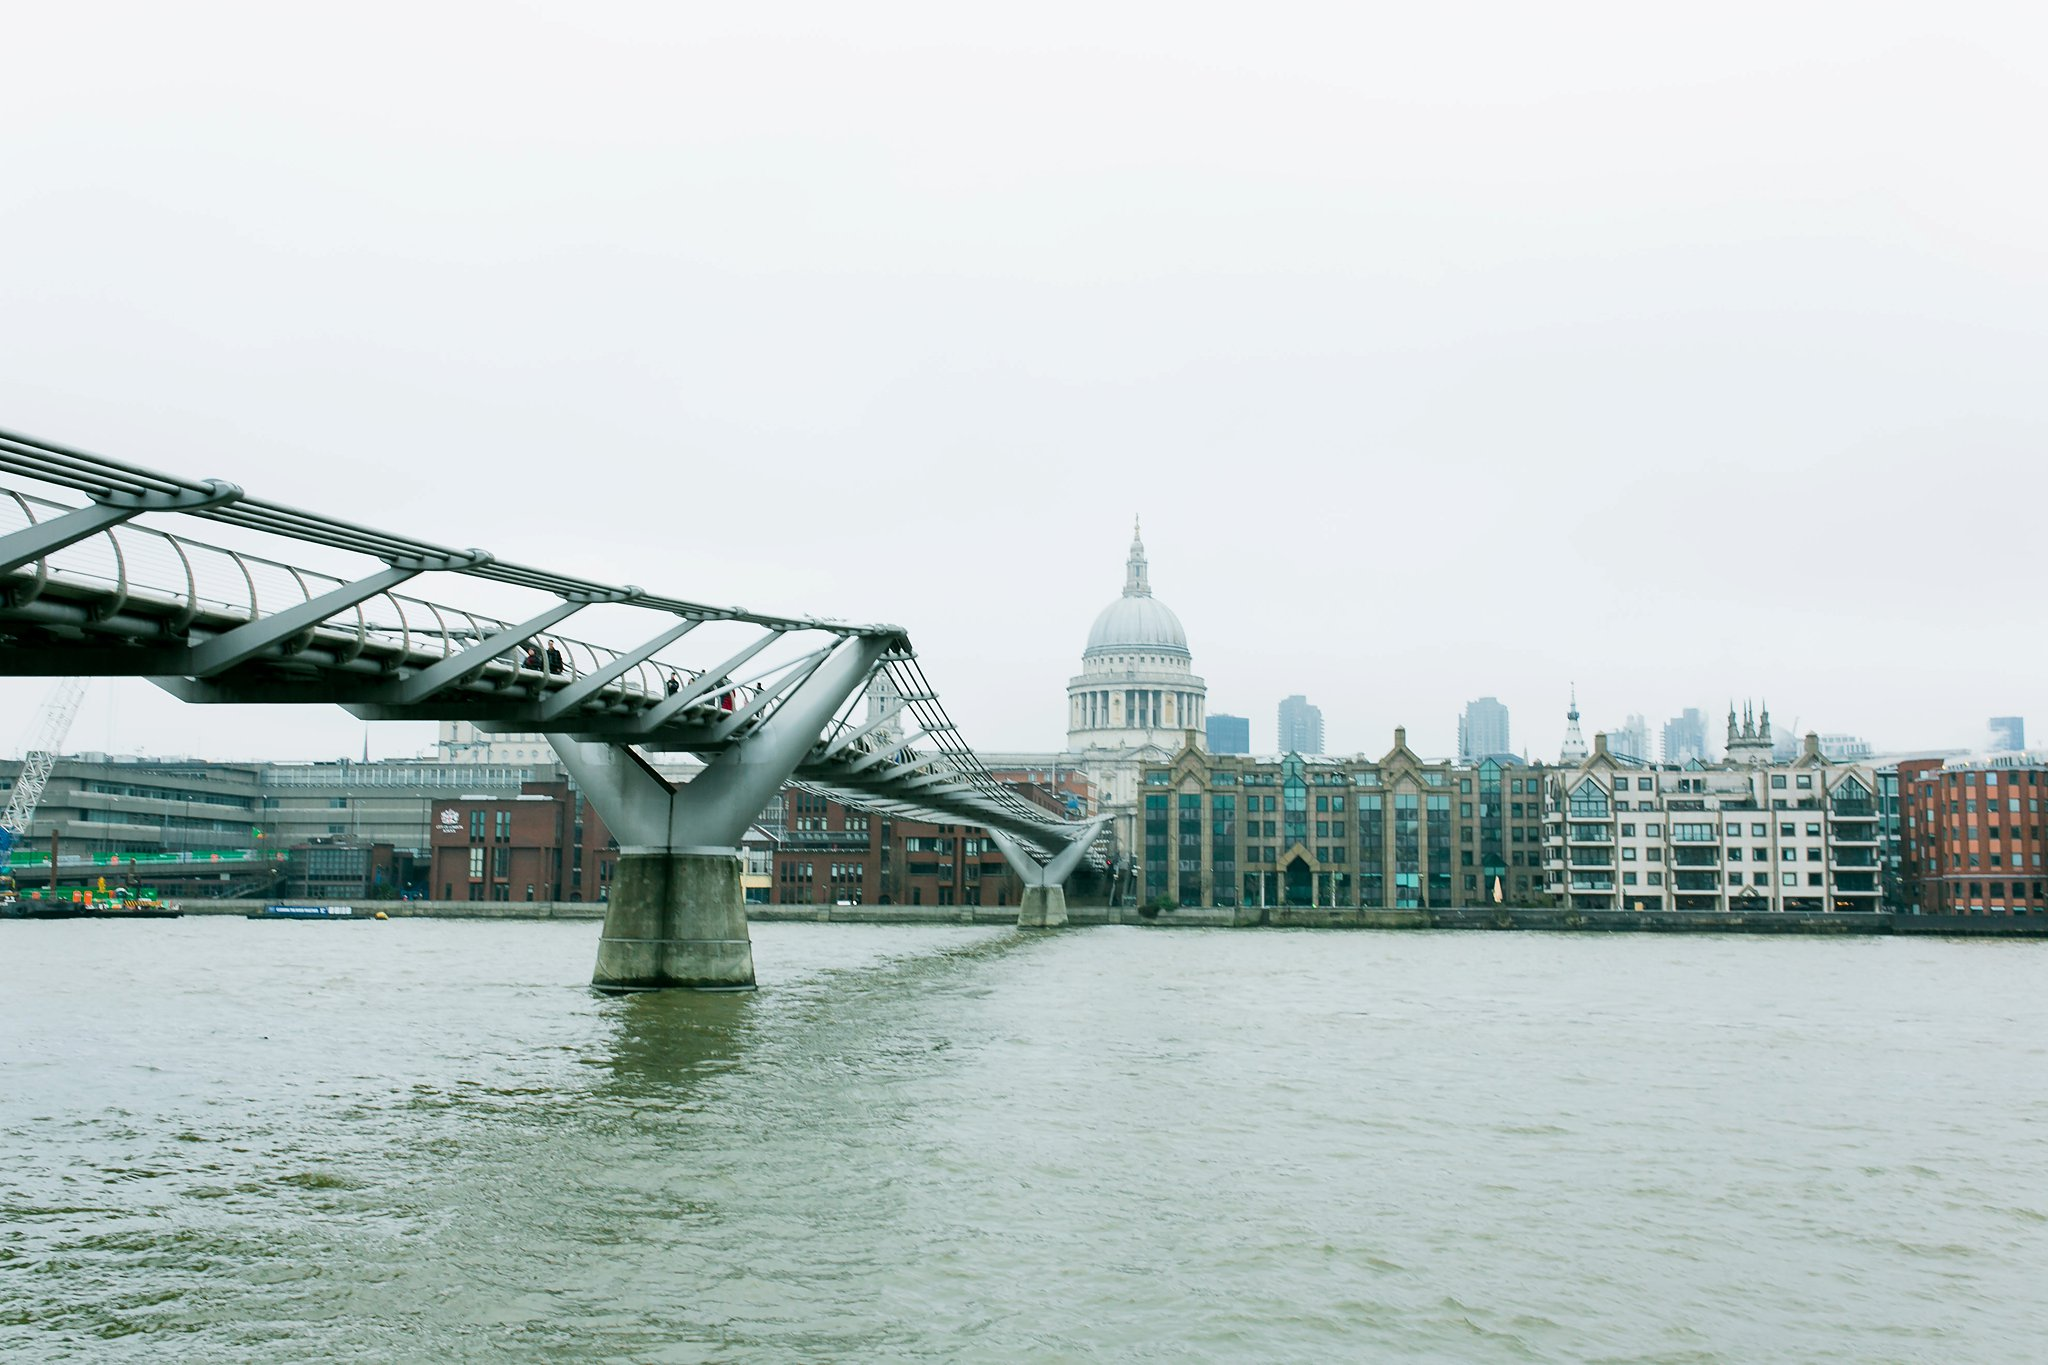 London Part II Westminster Abbey Tower Bridge Tower of London Big Ben-1636.jpg